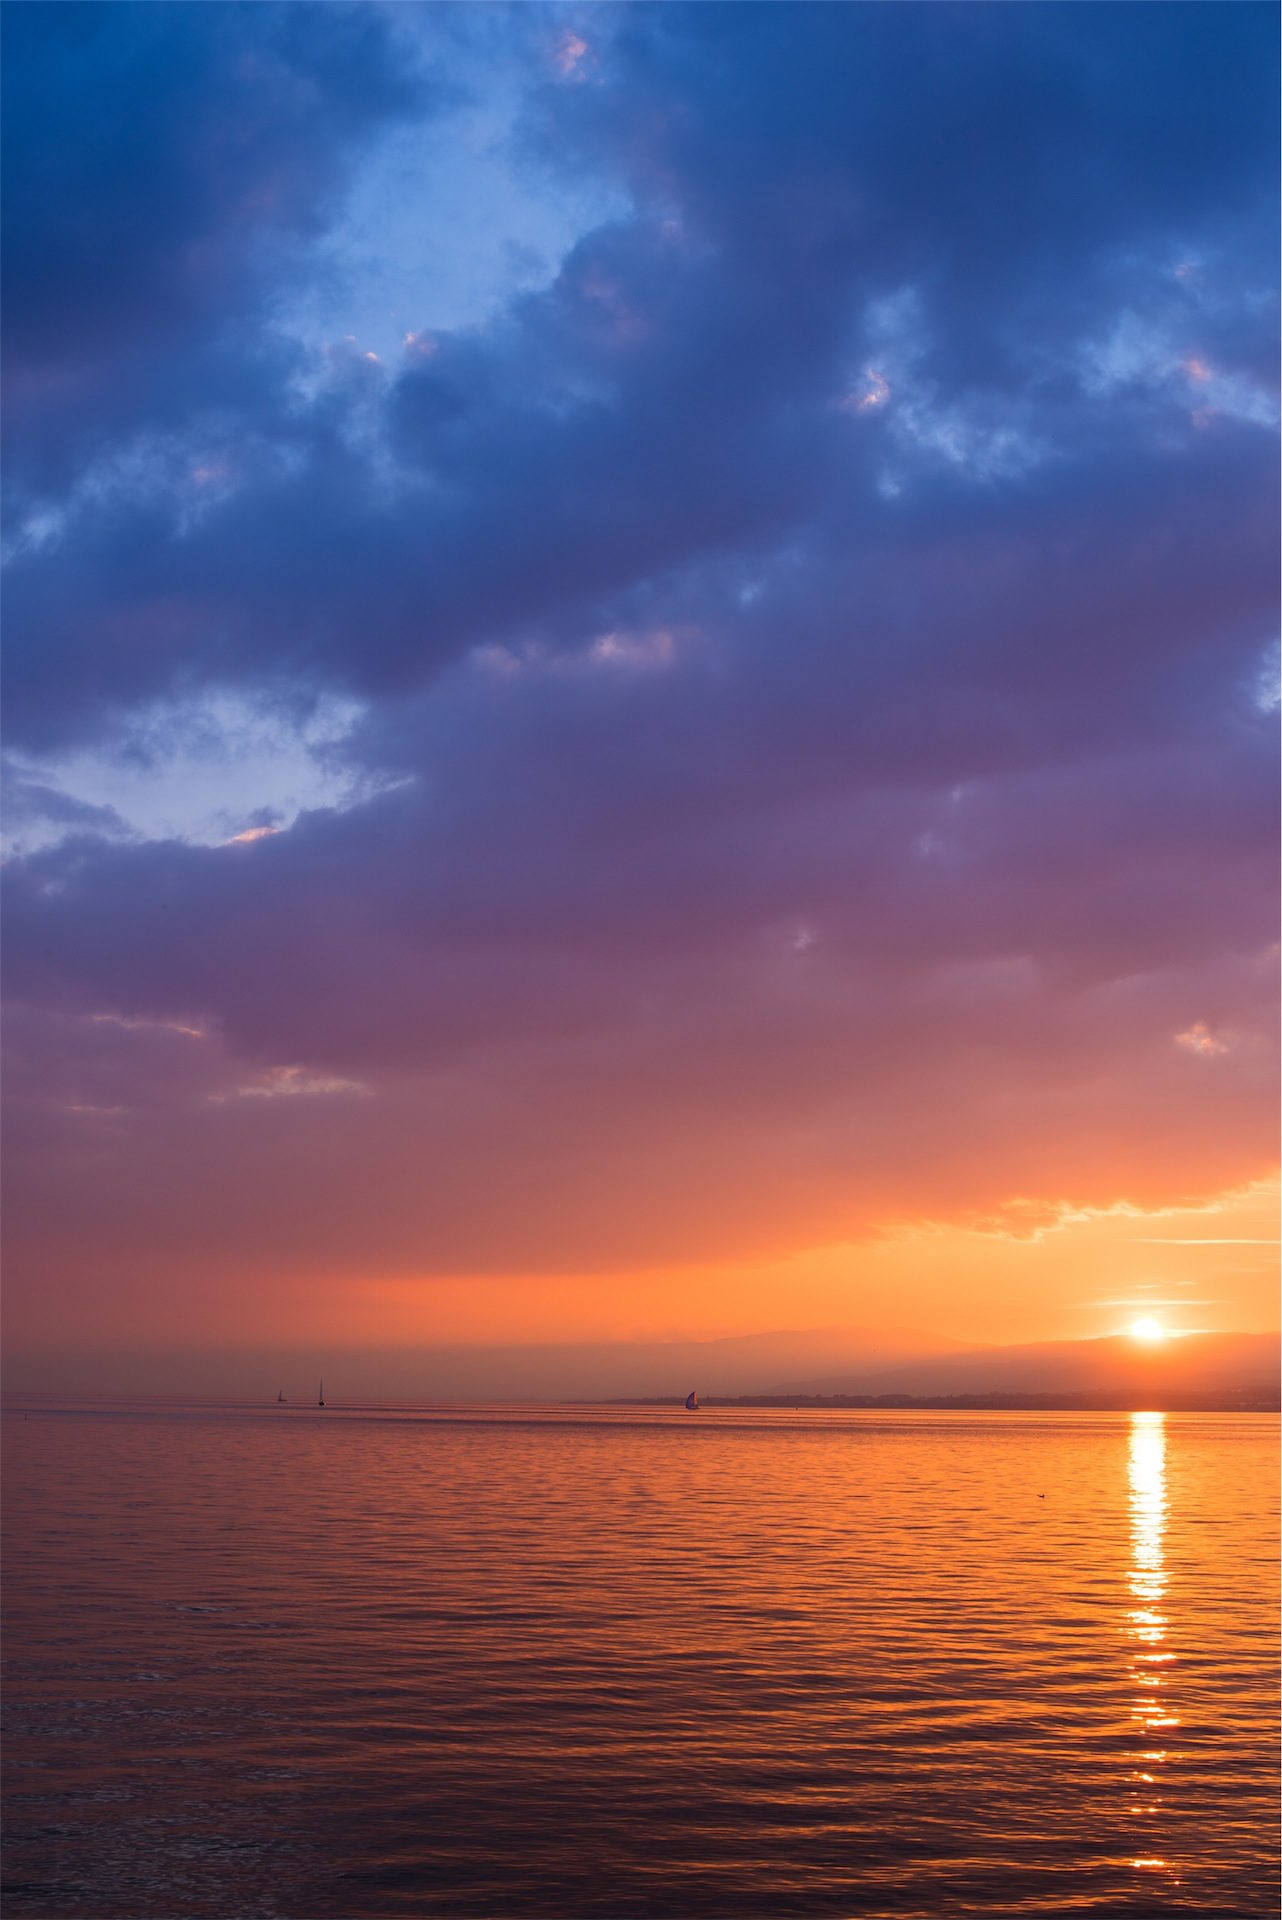 आकाश, सूर्यास्त, बादल, रंगीन, सागर - HD वॉलपेपर - प्रोफेसर-falken.com